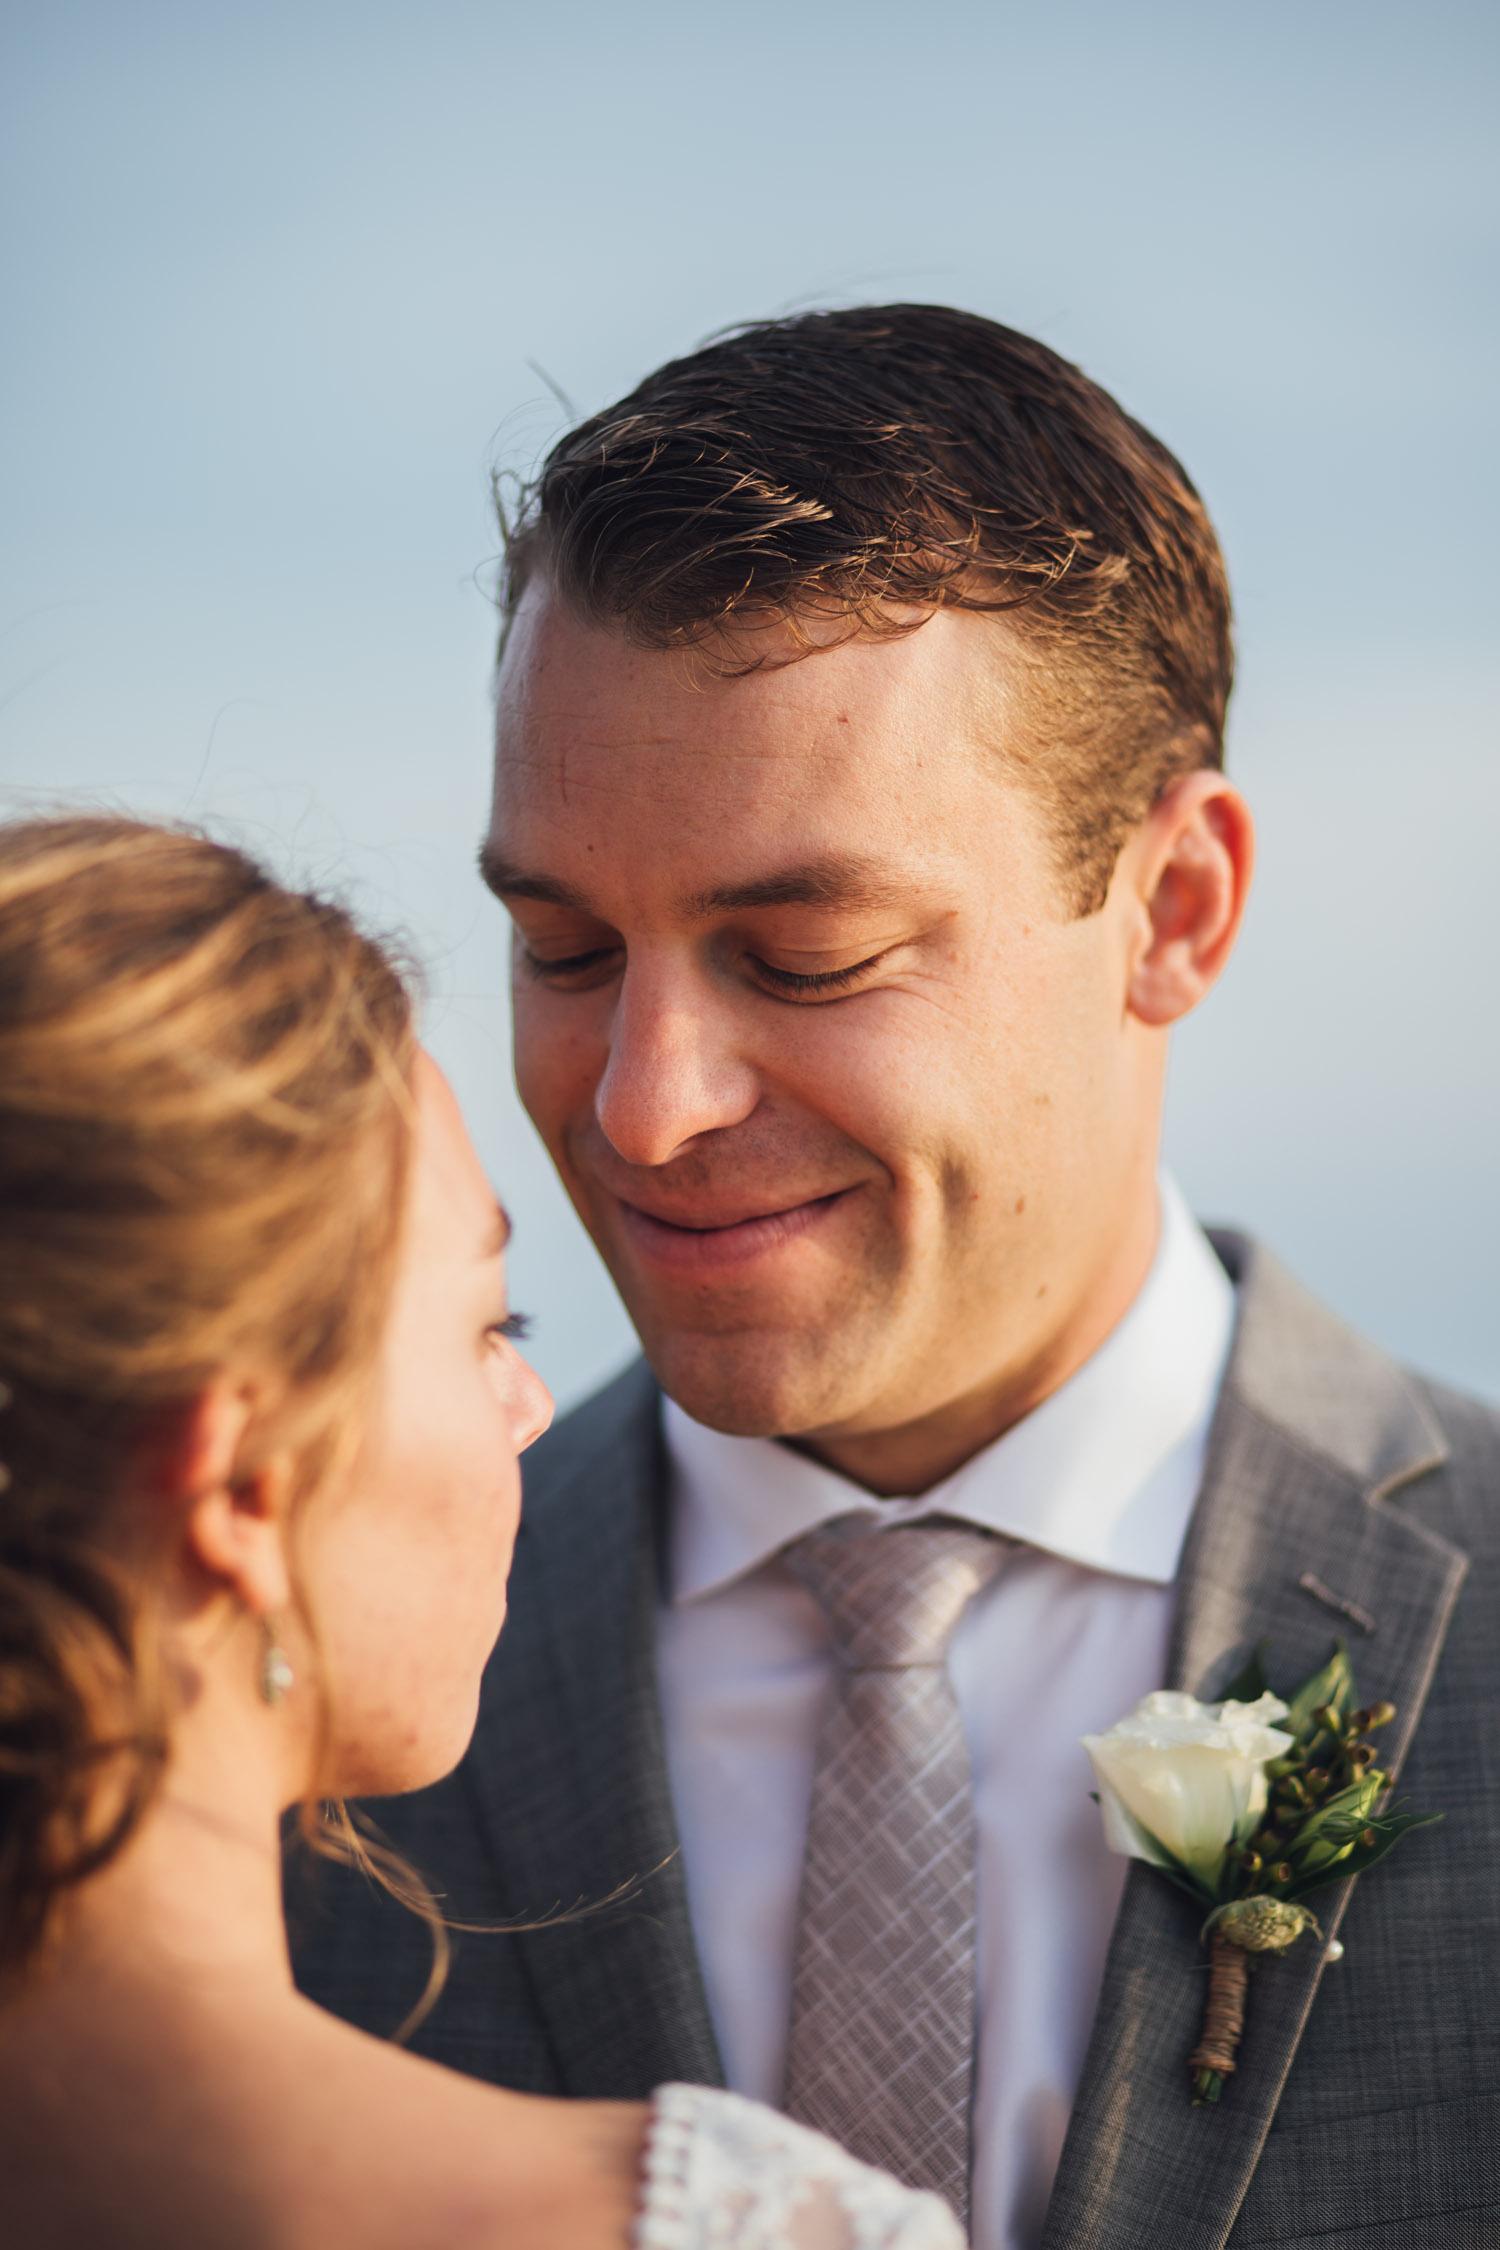 wedding-photography-santa-cruz-129